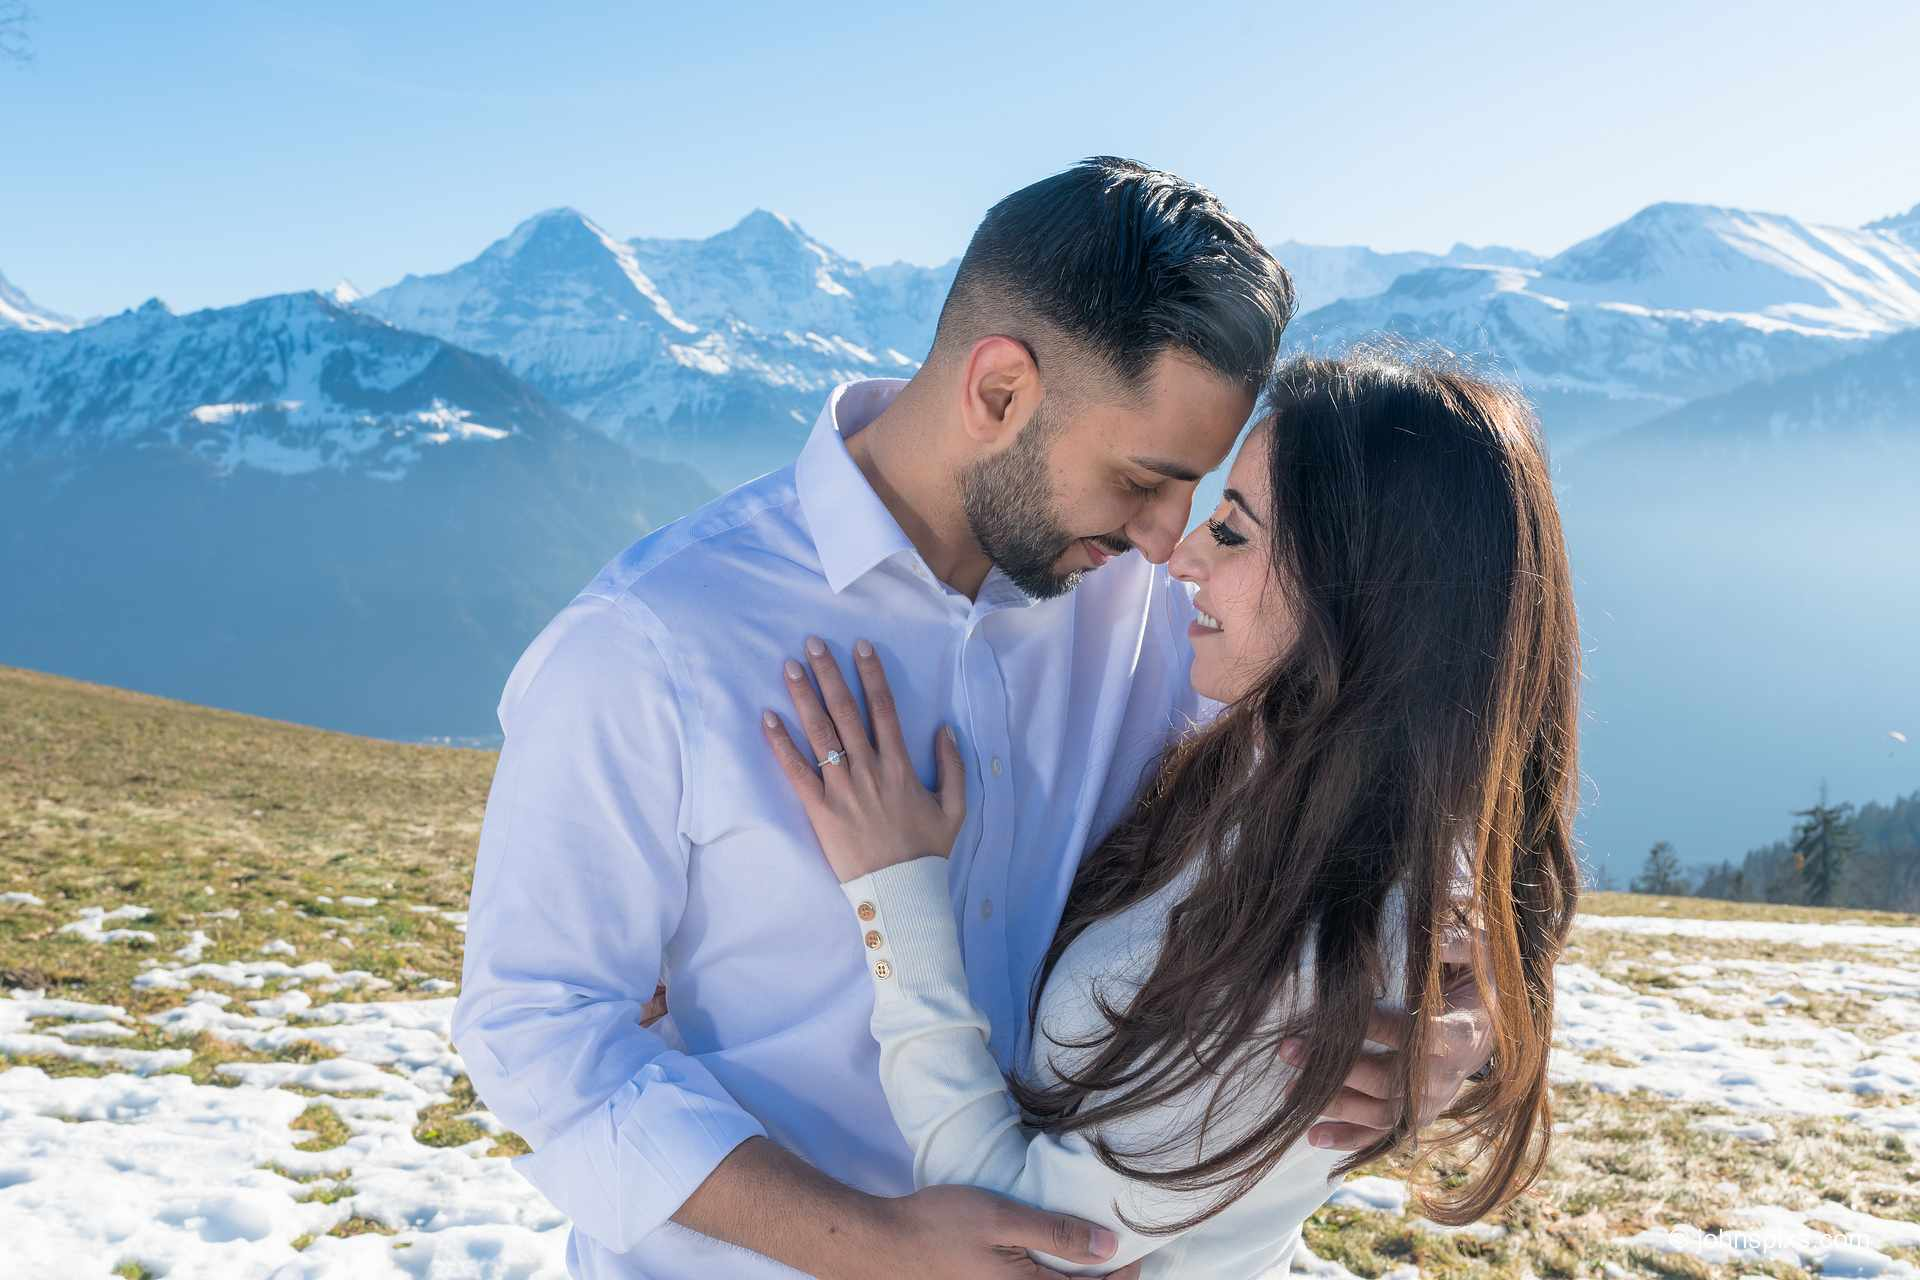 Engagement photo shoot near Interlaken